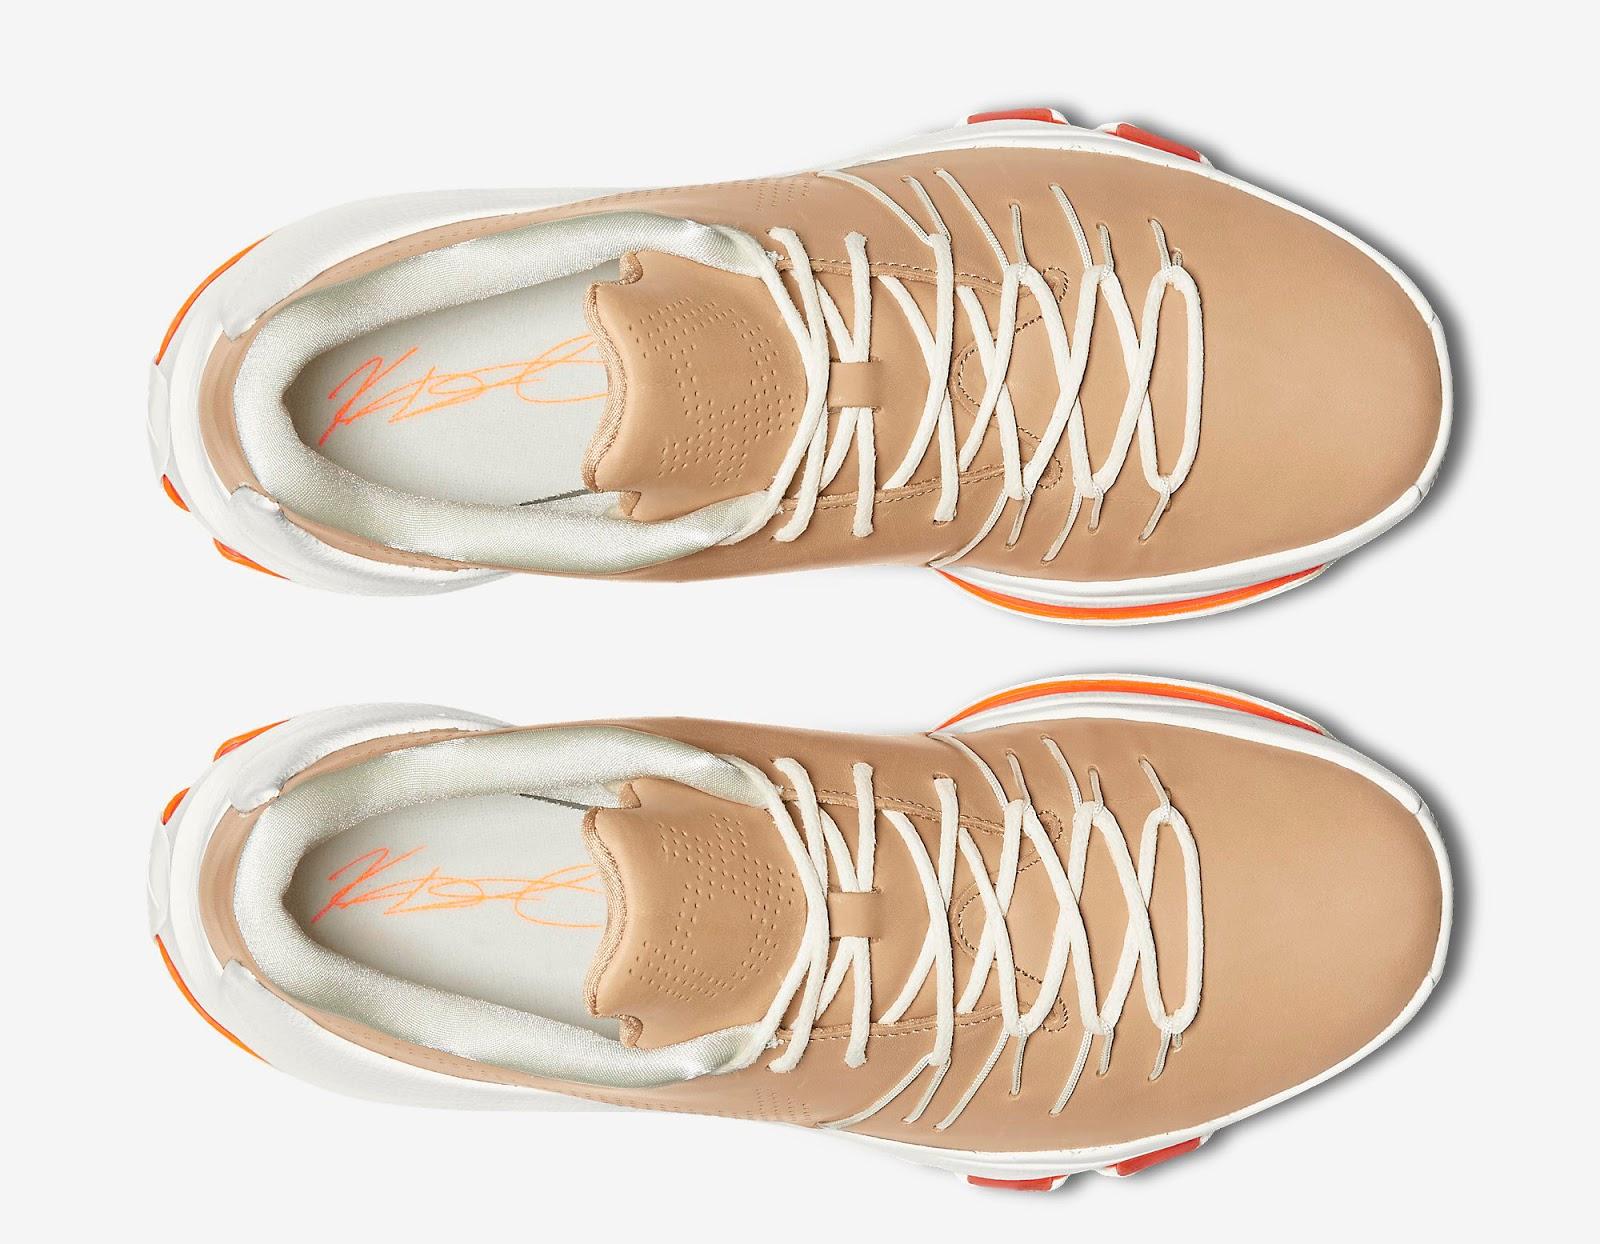 083867c4f5c0 Nike KD 8 EXT Vachetta Tan Orange 806393-200 ajordanxi Your 1 Source For  Sneaker Release Dates Nike KD 8 ...